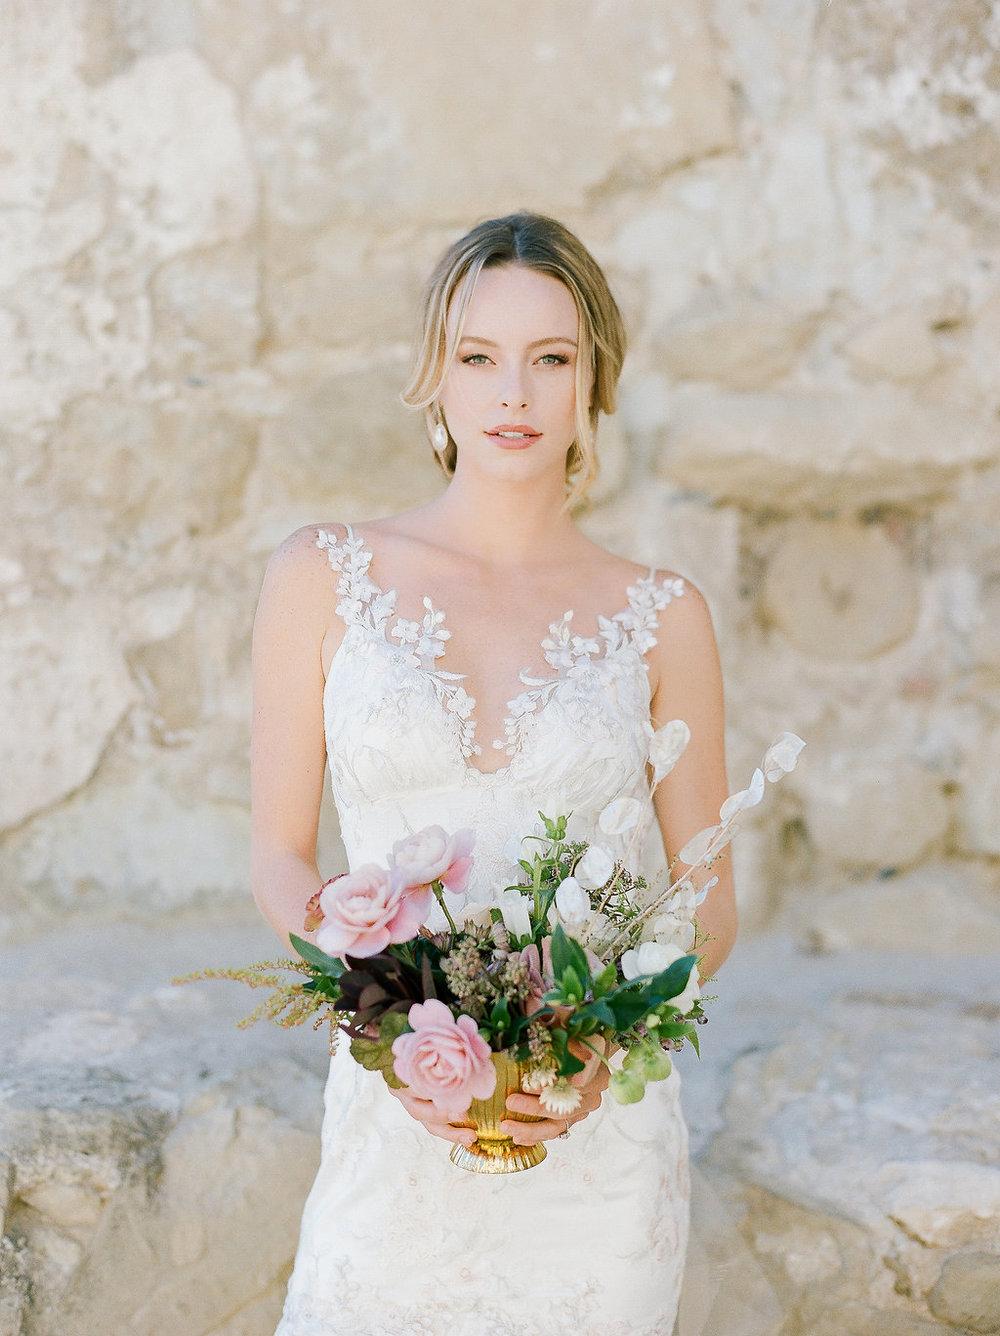 Spanish Mission Style Wedding Ideas Summer Flowers Finding Flora San Juan Capistrano European Venues California Bride Centerpiece Lunaria